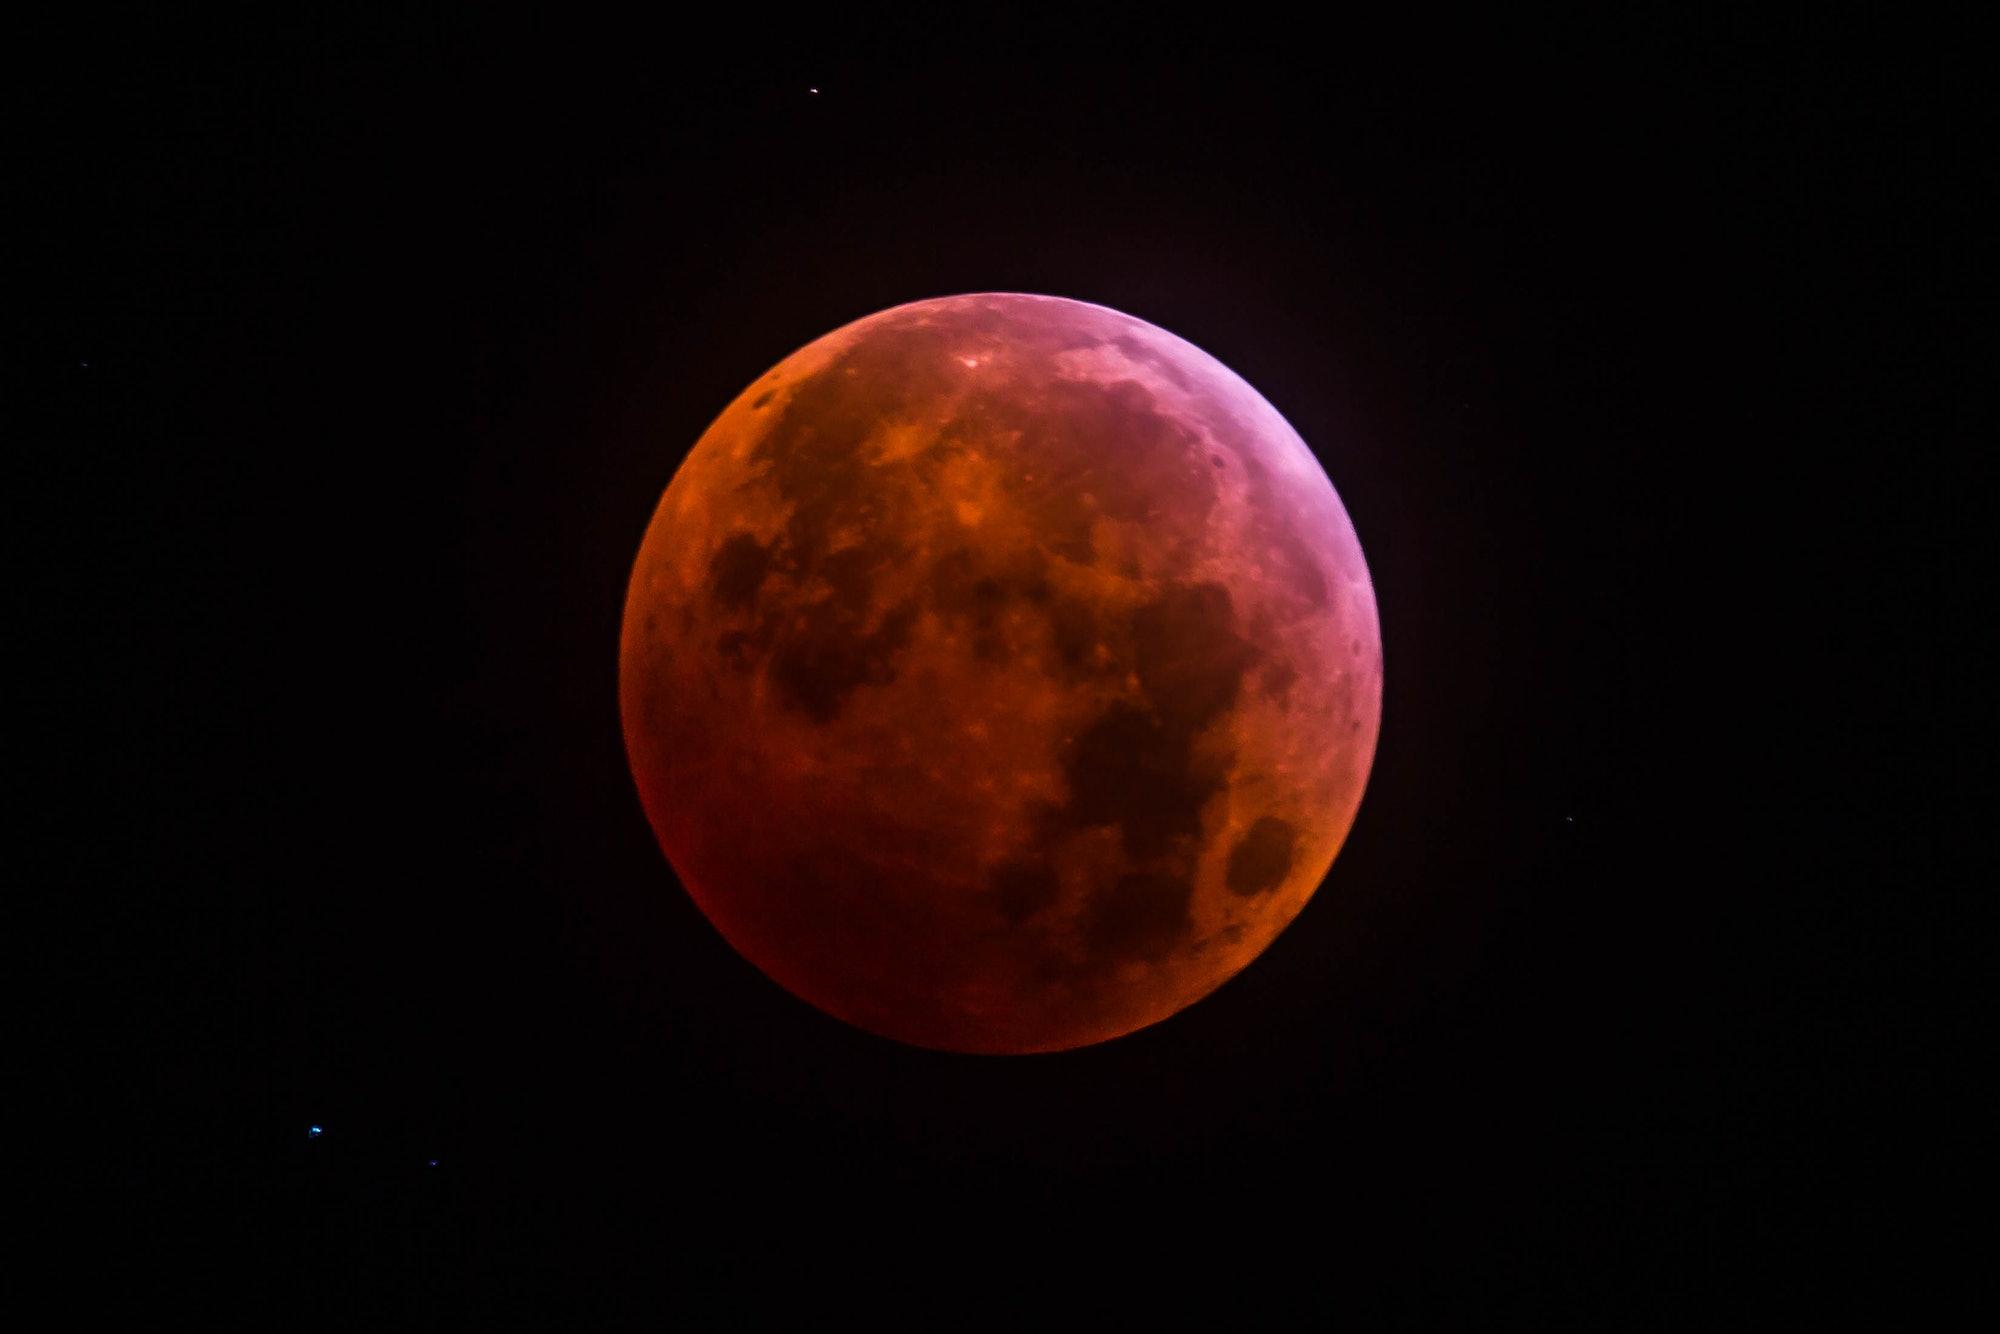 Total (Penumbral) Lunar eclipse